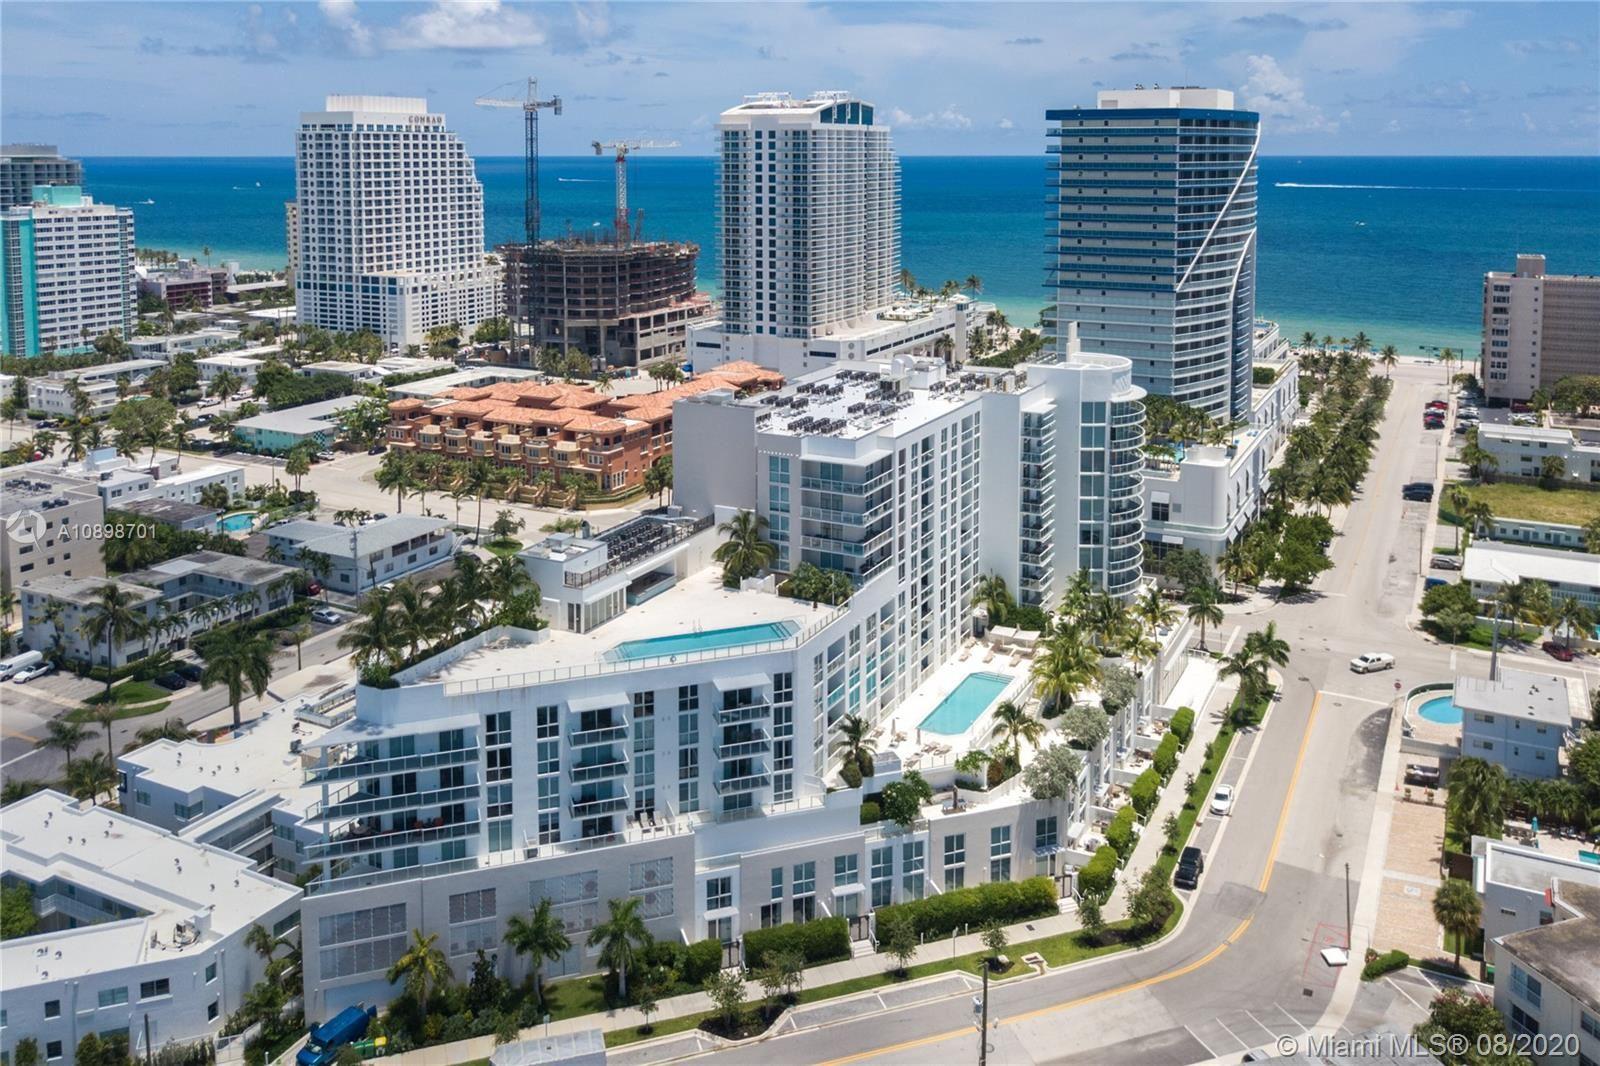 401 N Birch Rd #613, Fort Lauderdale, FL 33304 - #: A10898701